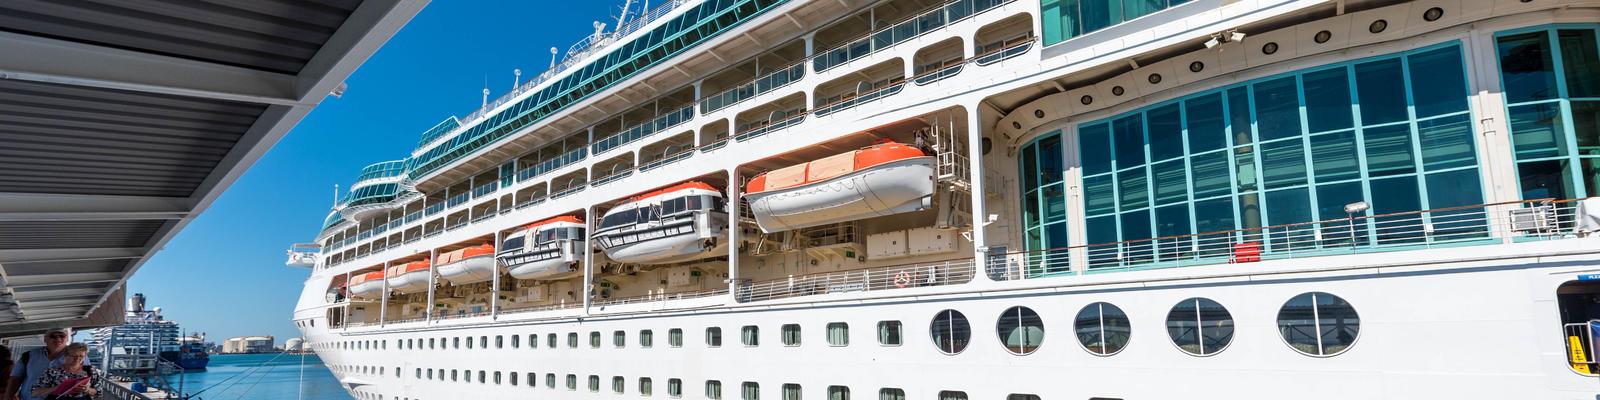 Rhapsody of the Seas in Barcelona (Photo: Cruise Critic)